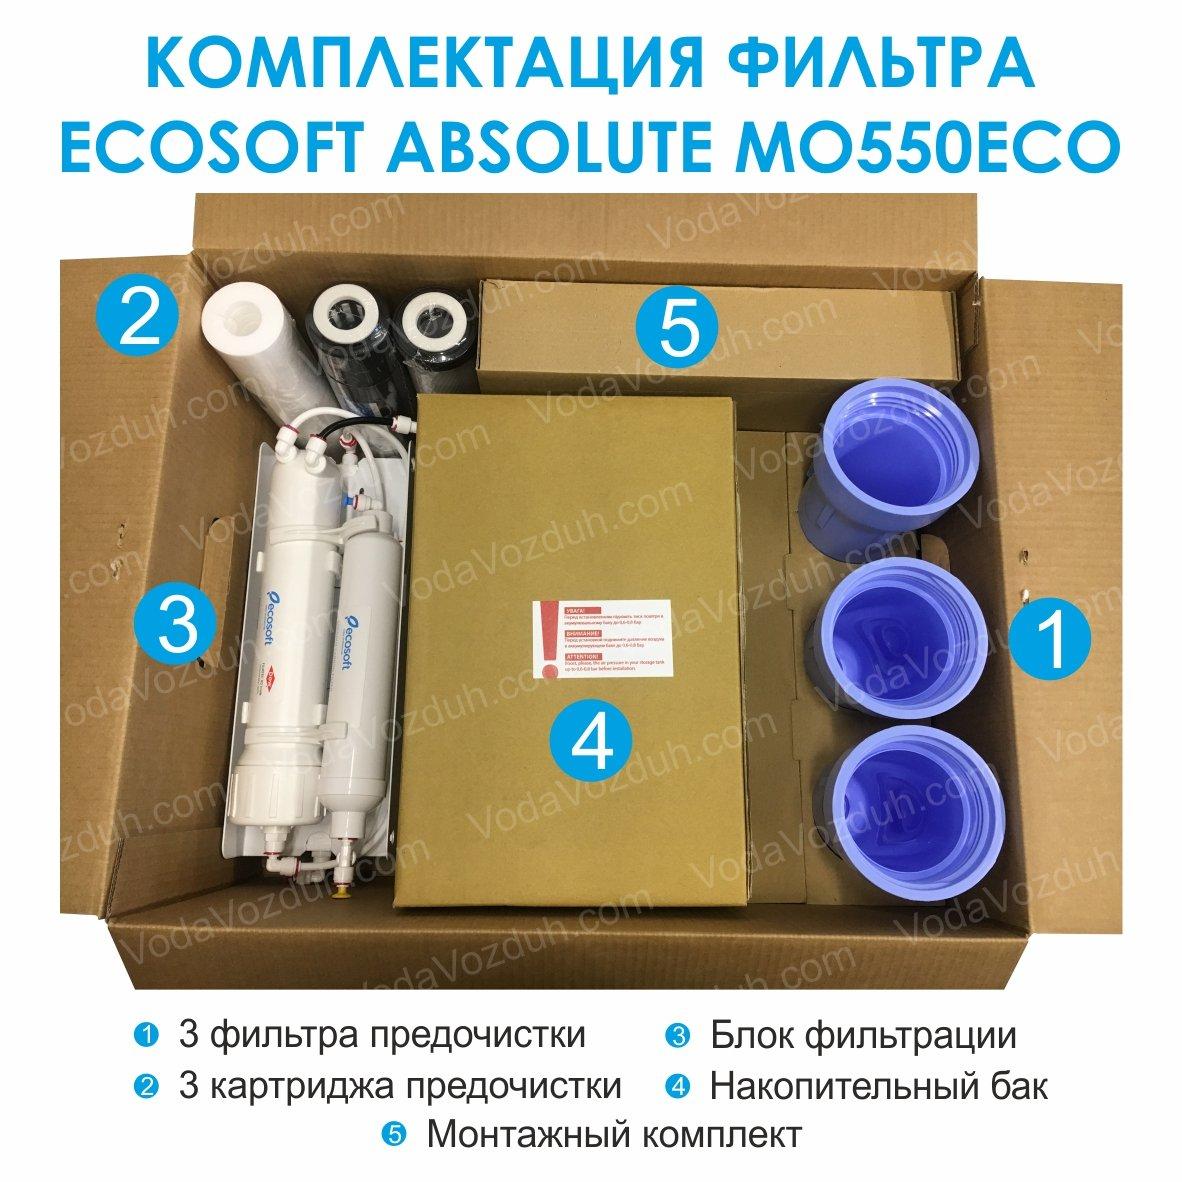 Ecosoft Absolute 5-50 MO550ECO комплектация